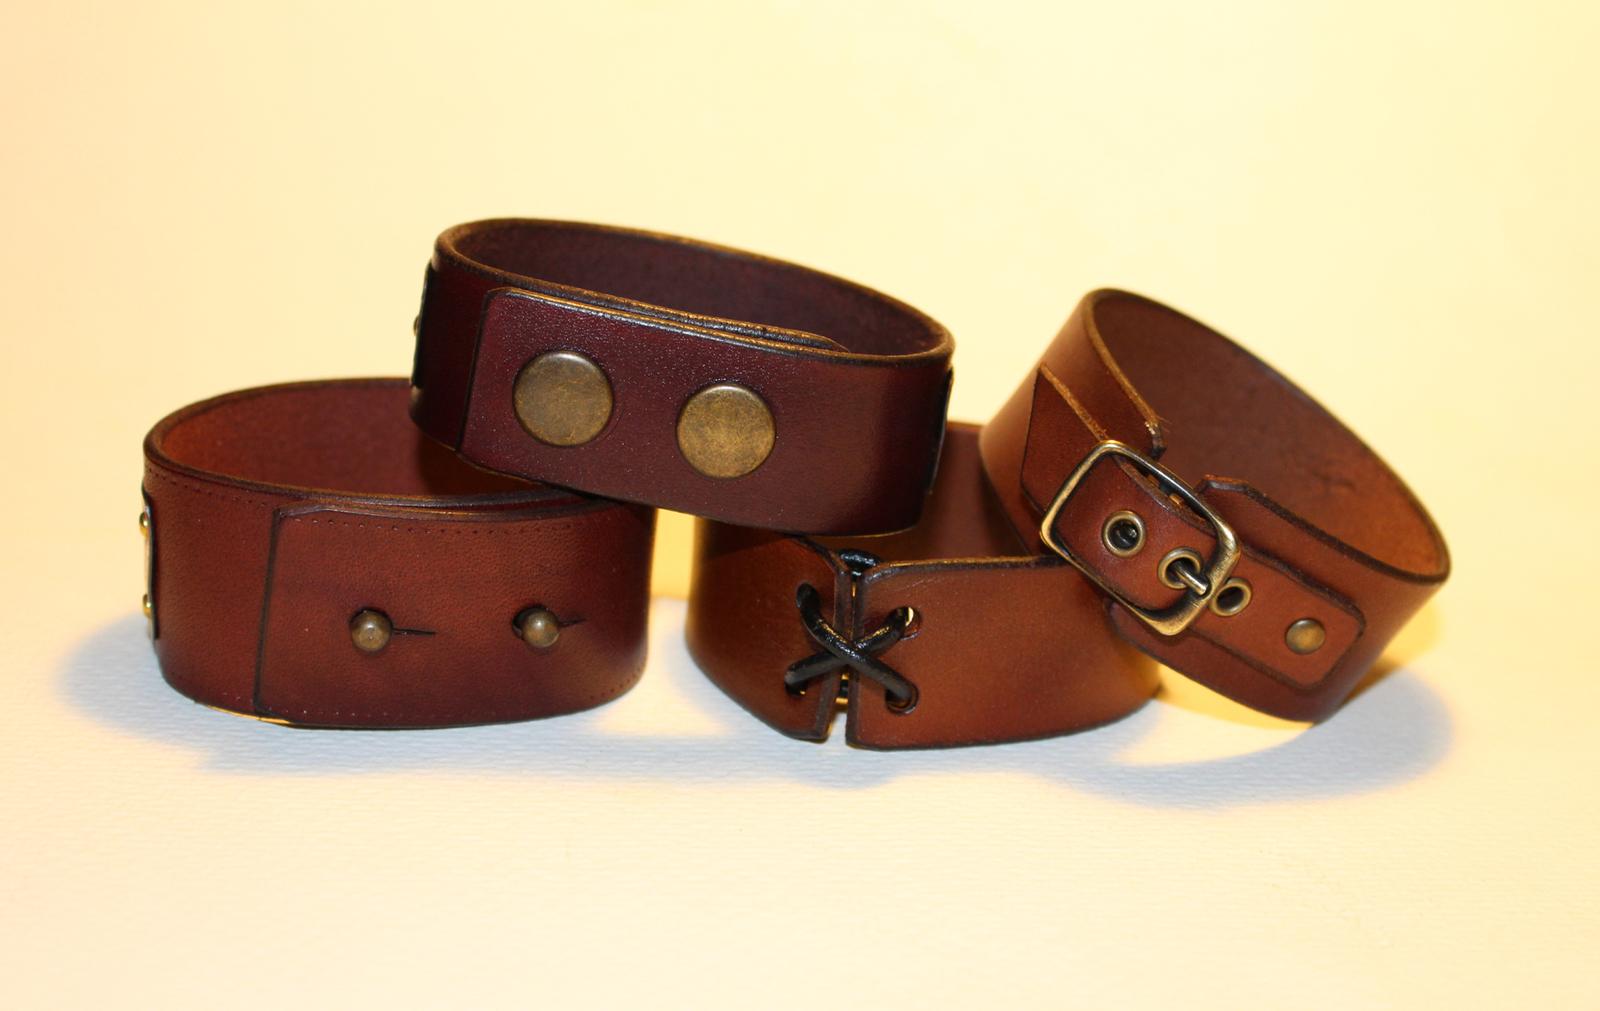 Only God can judge me - Mens leather cuff bracelet, hebrew inscription image 3